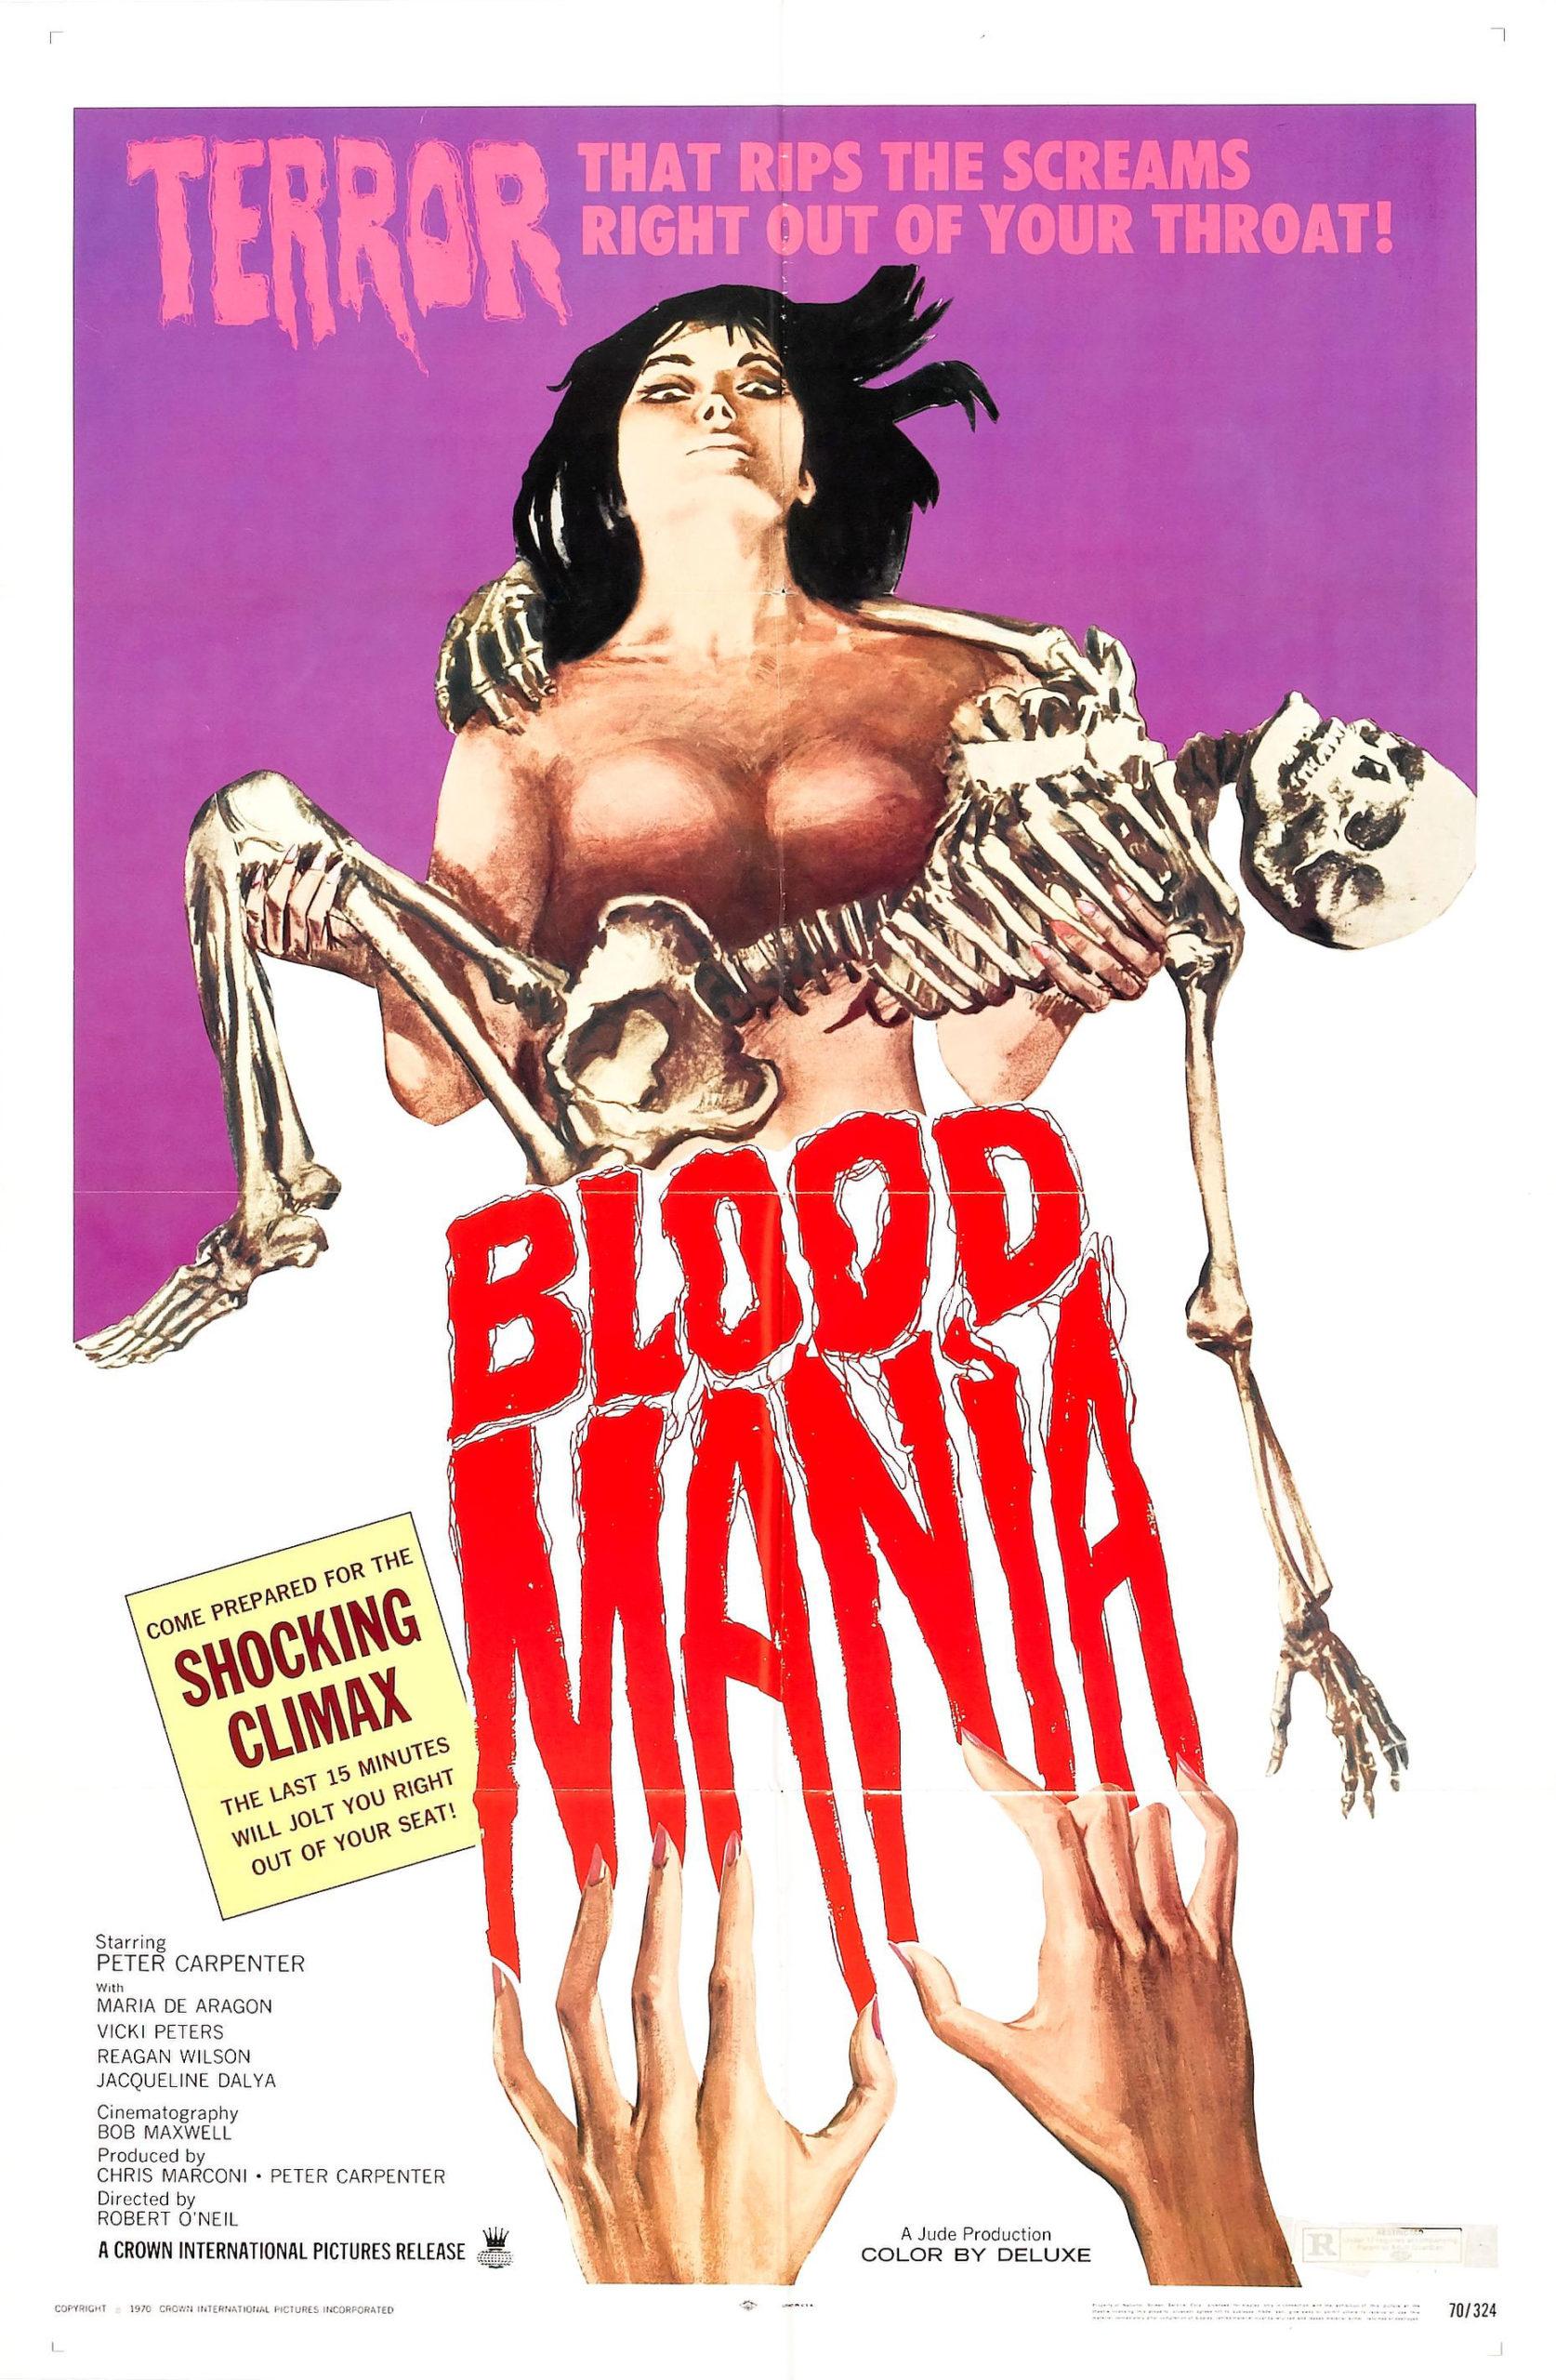 Blood Mania film poster